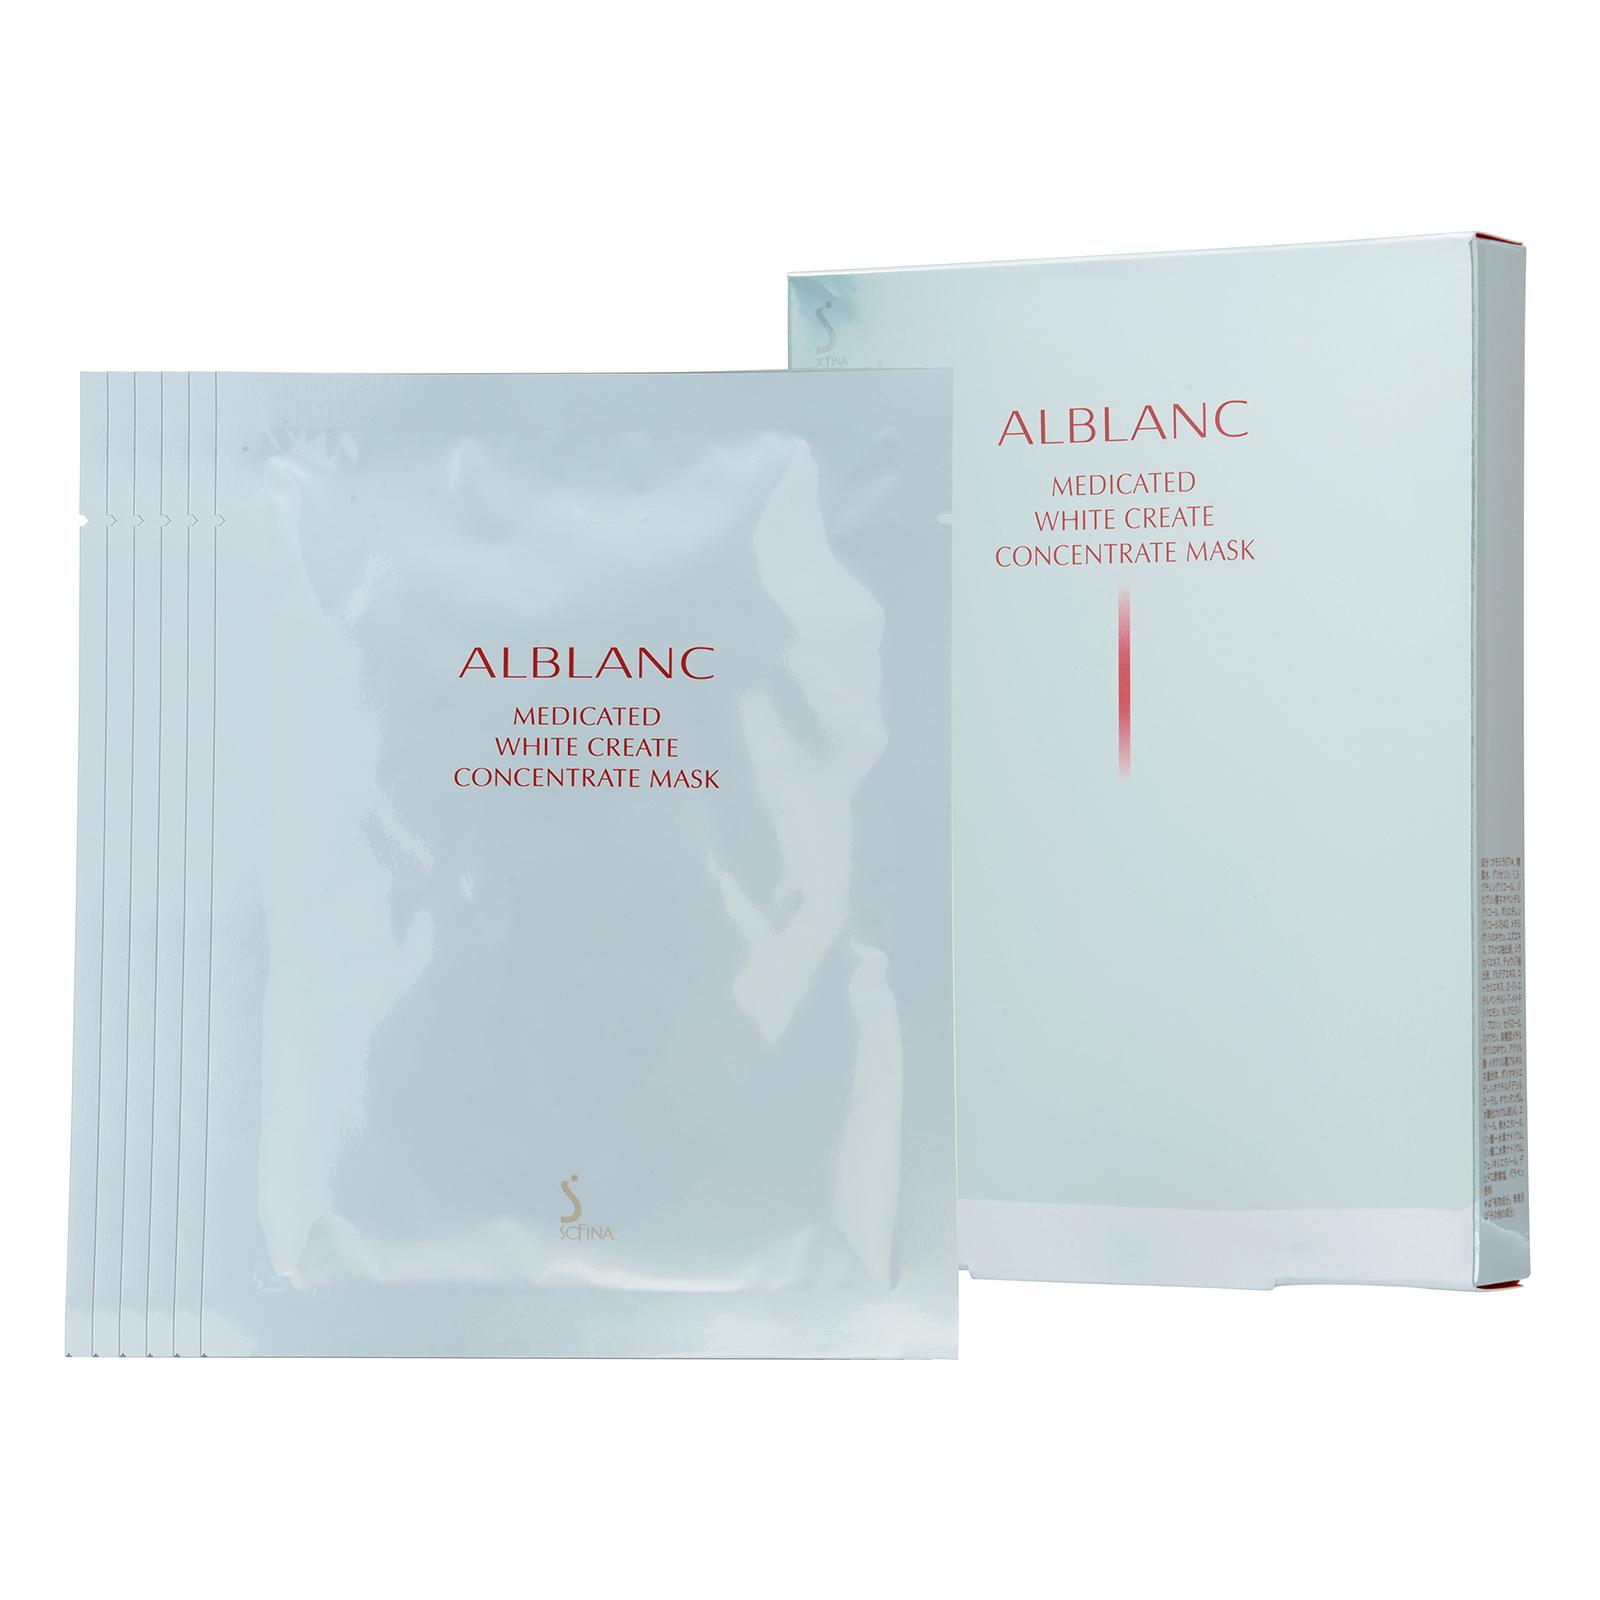 SOFINA Alblanc  Medicated White Create Concentrate Mask 1box, 6pcs